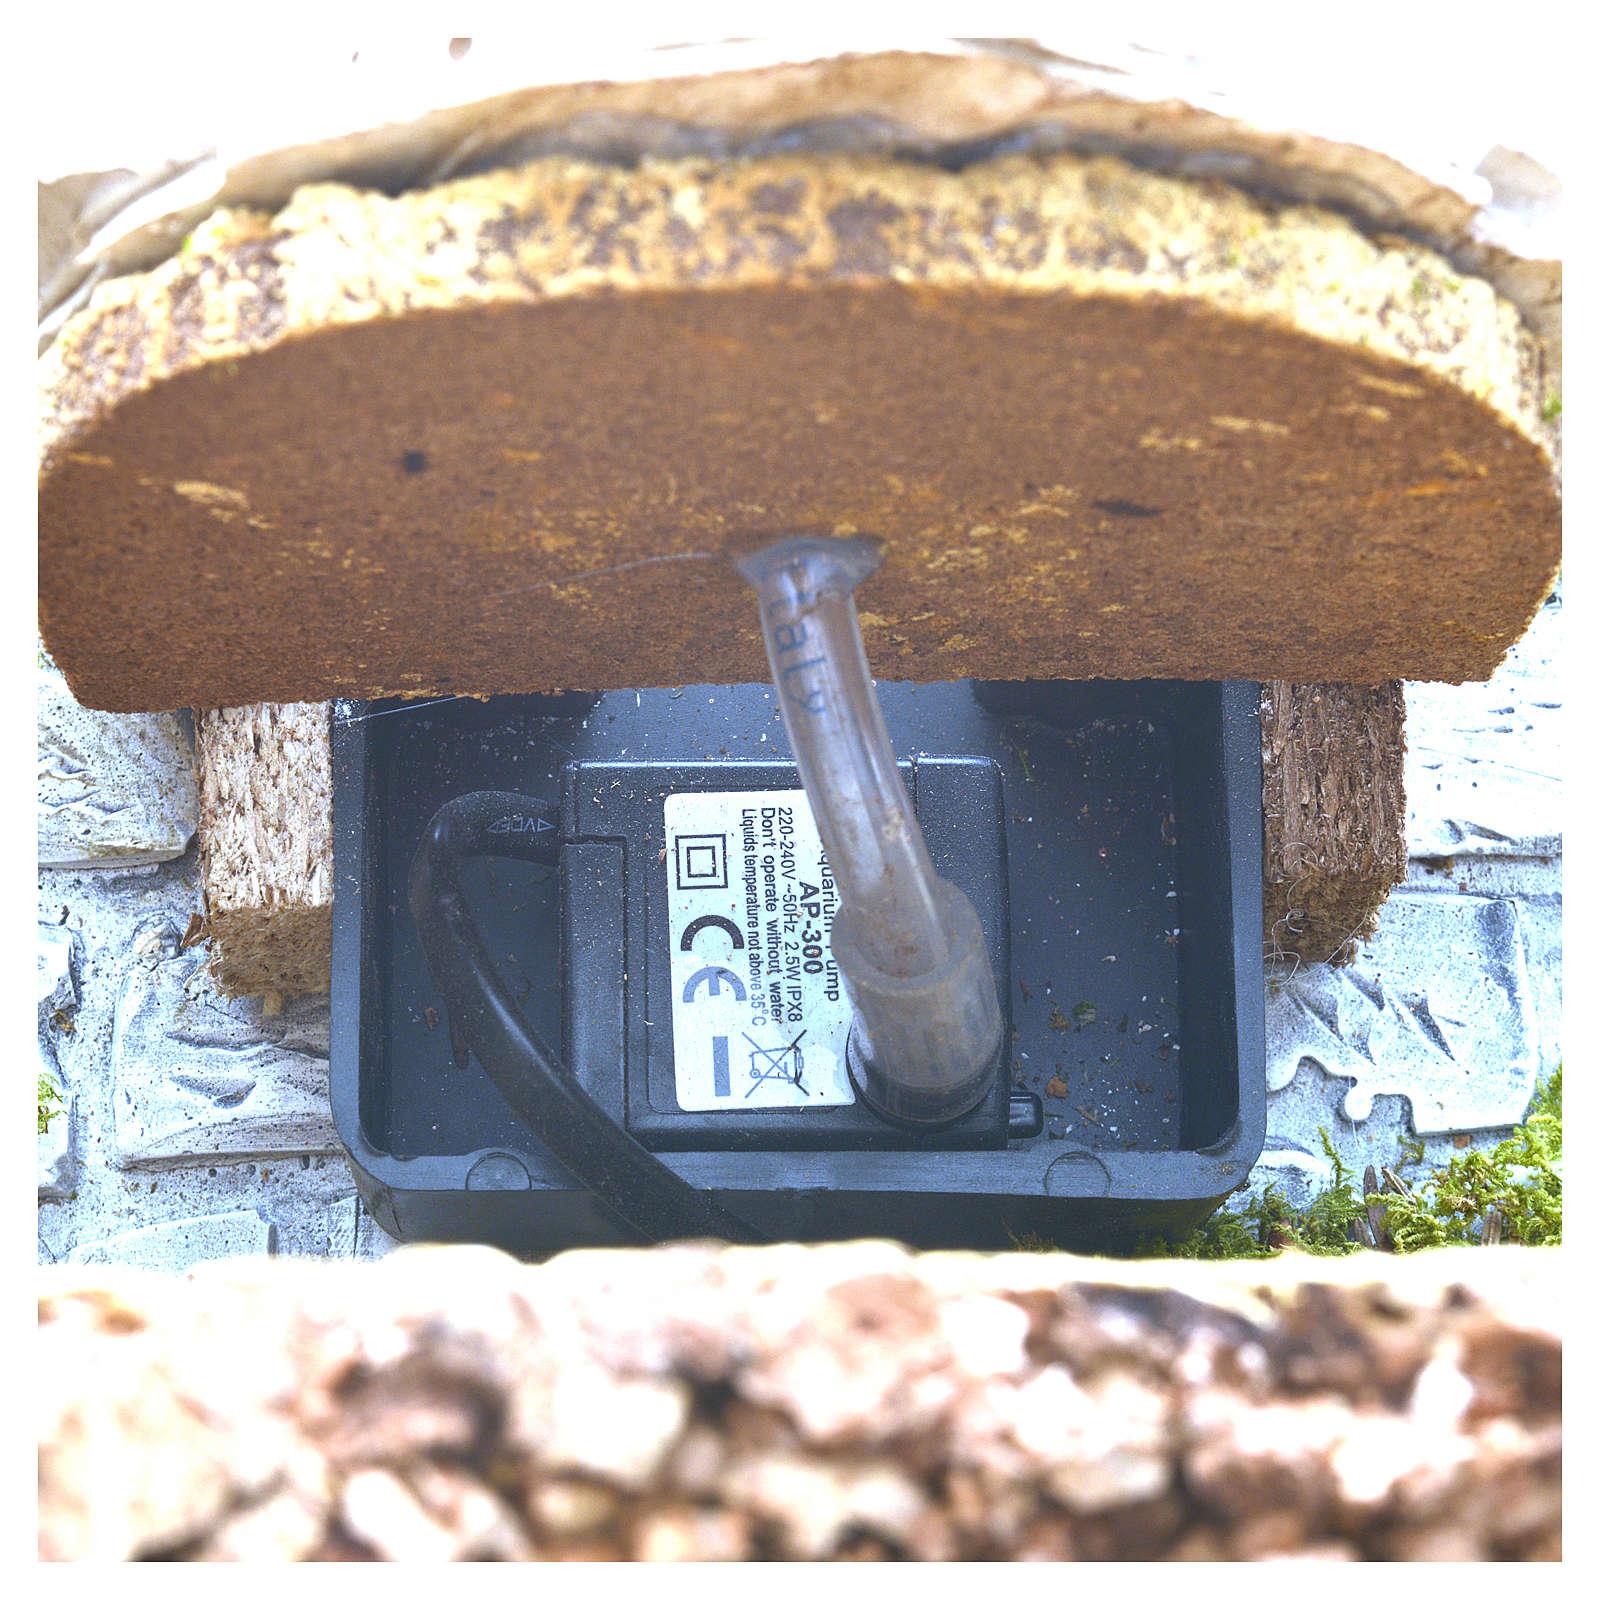 Fontana in gesso con ambiente in sughero 32x24x24 4